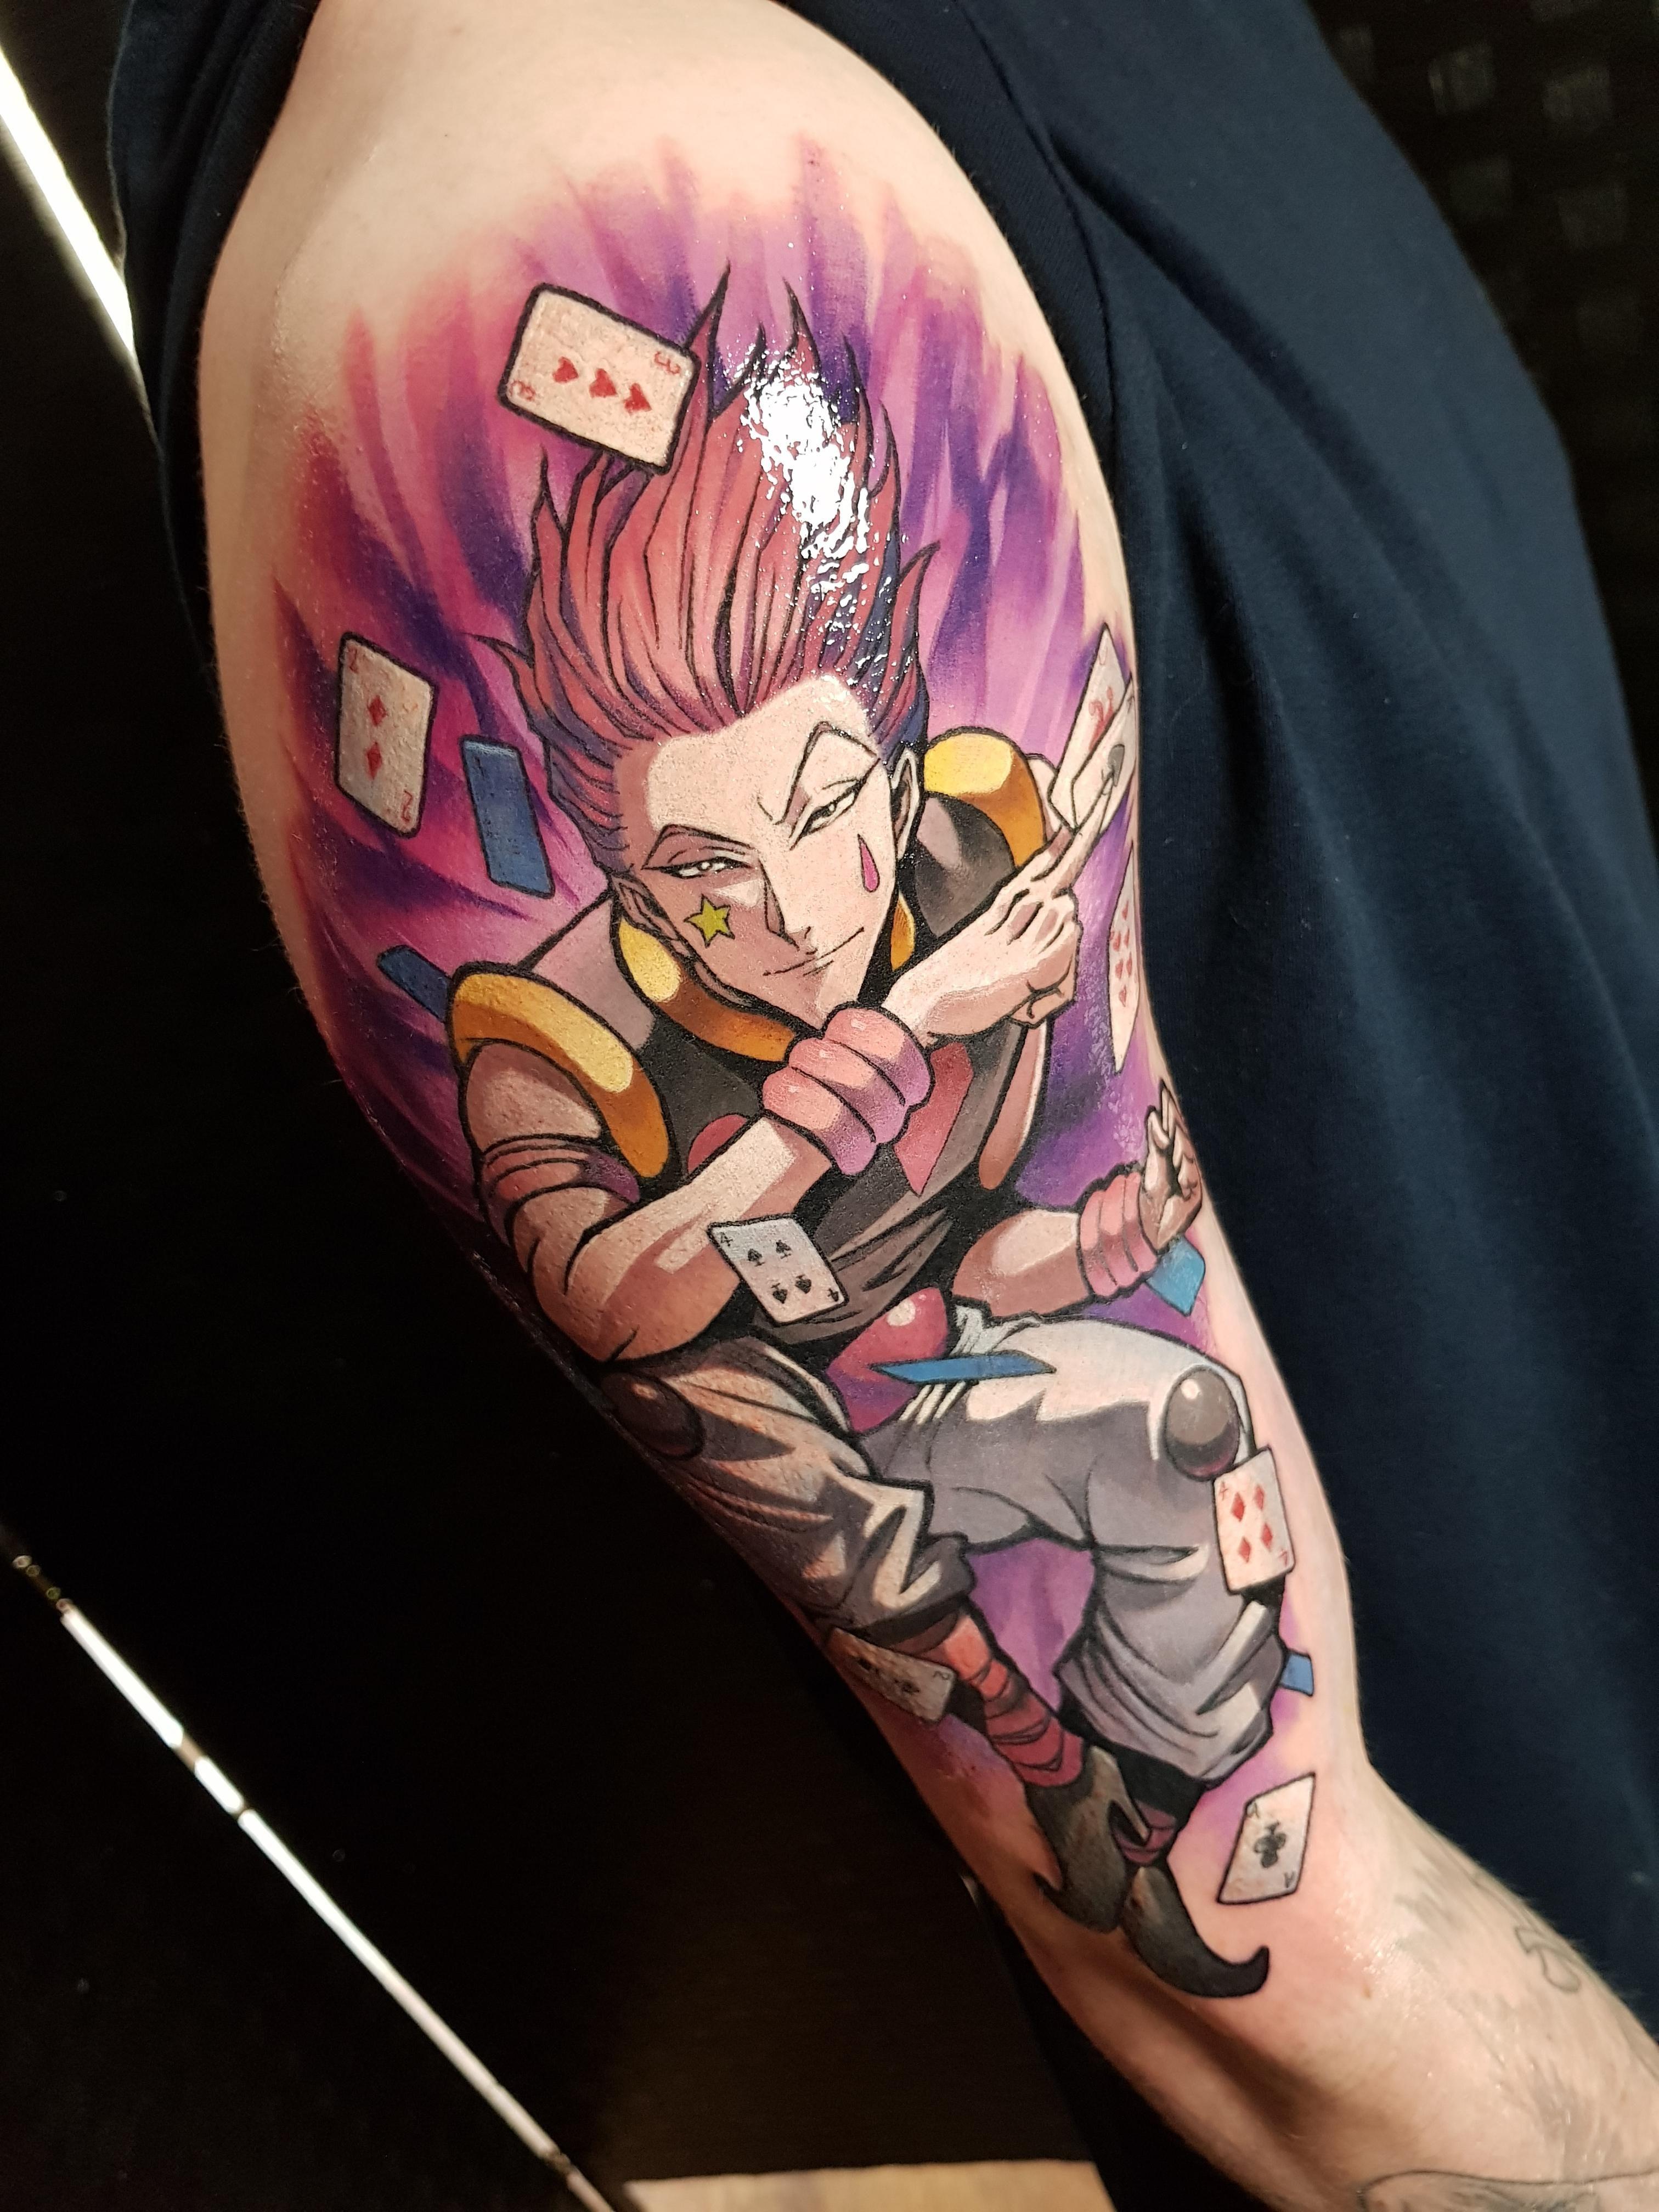 Hisoka tattoo by simon k bell liverpool uk hunter tattoo